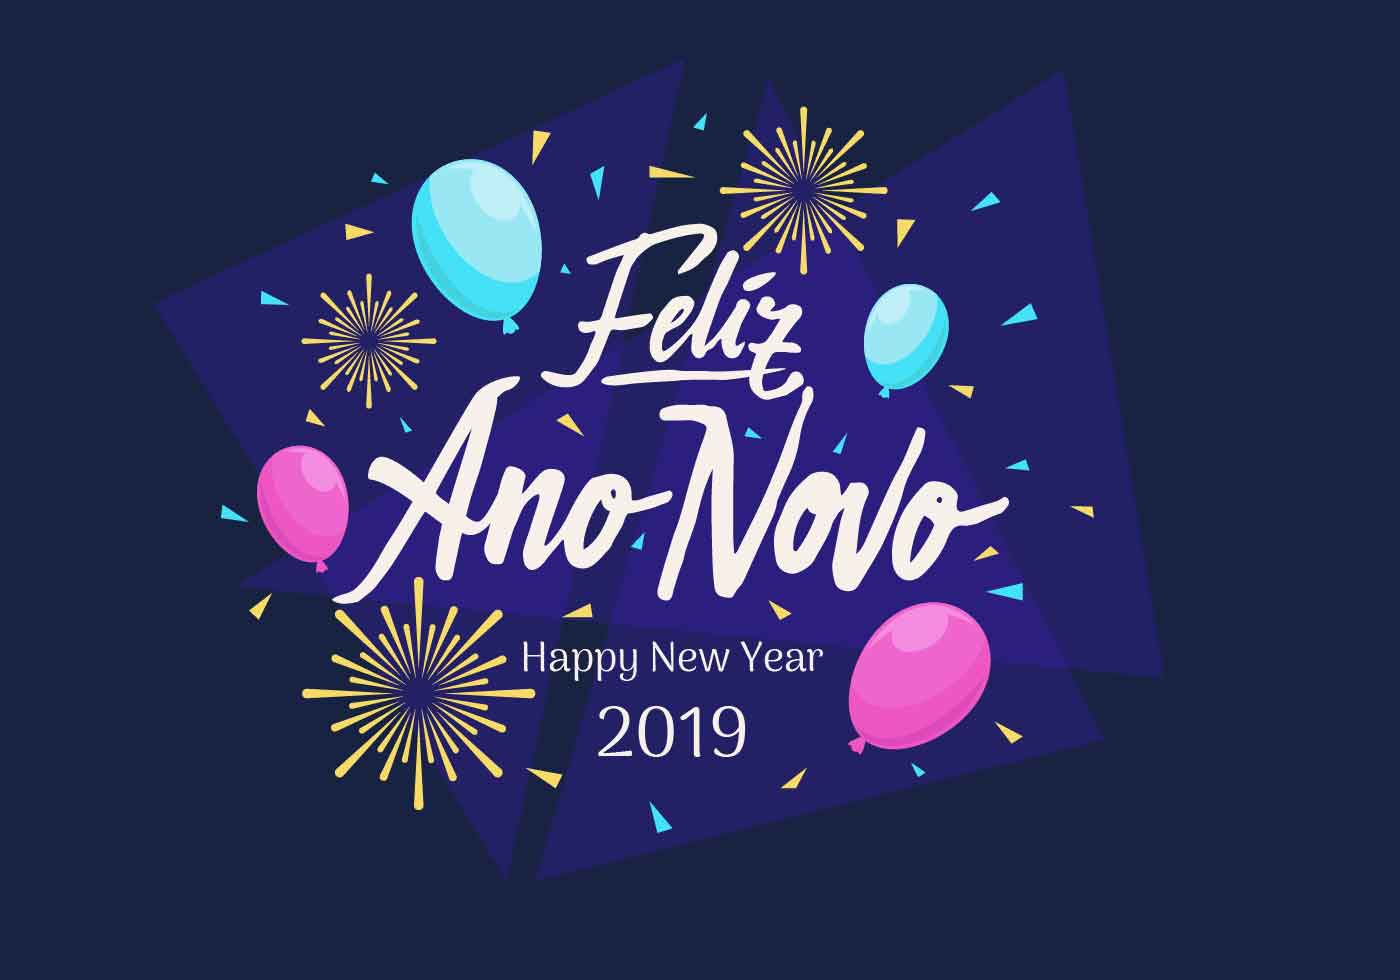 Feliz Ano Novo Hand Lettering Vector Download Free